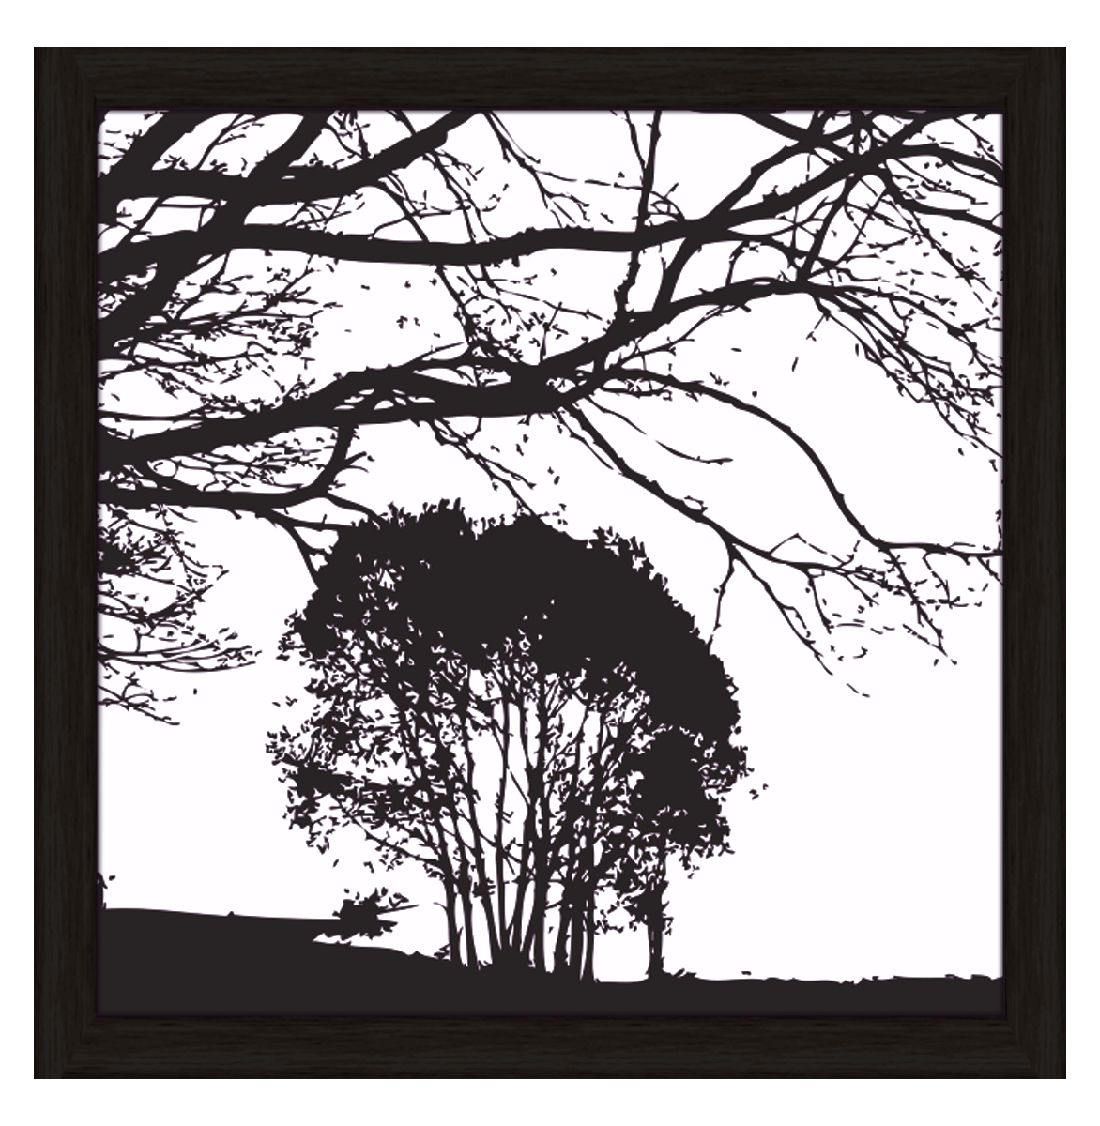 Kunstdruck Landschaft – 57,2 x 57,2 cm, Artland günstig